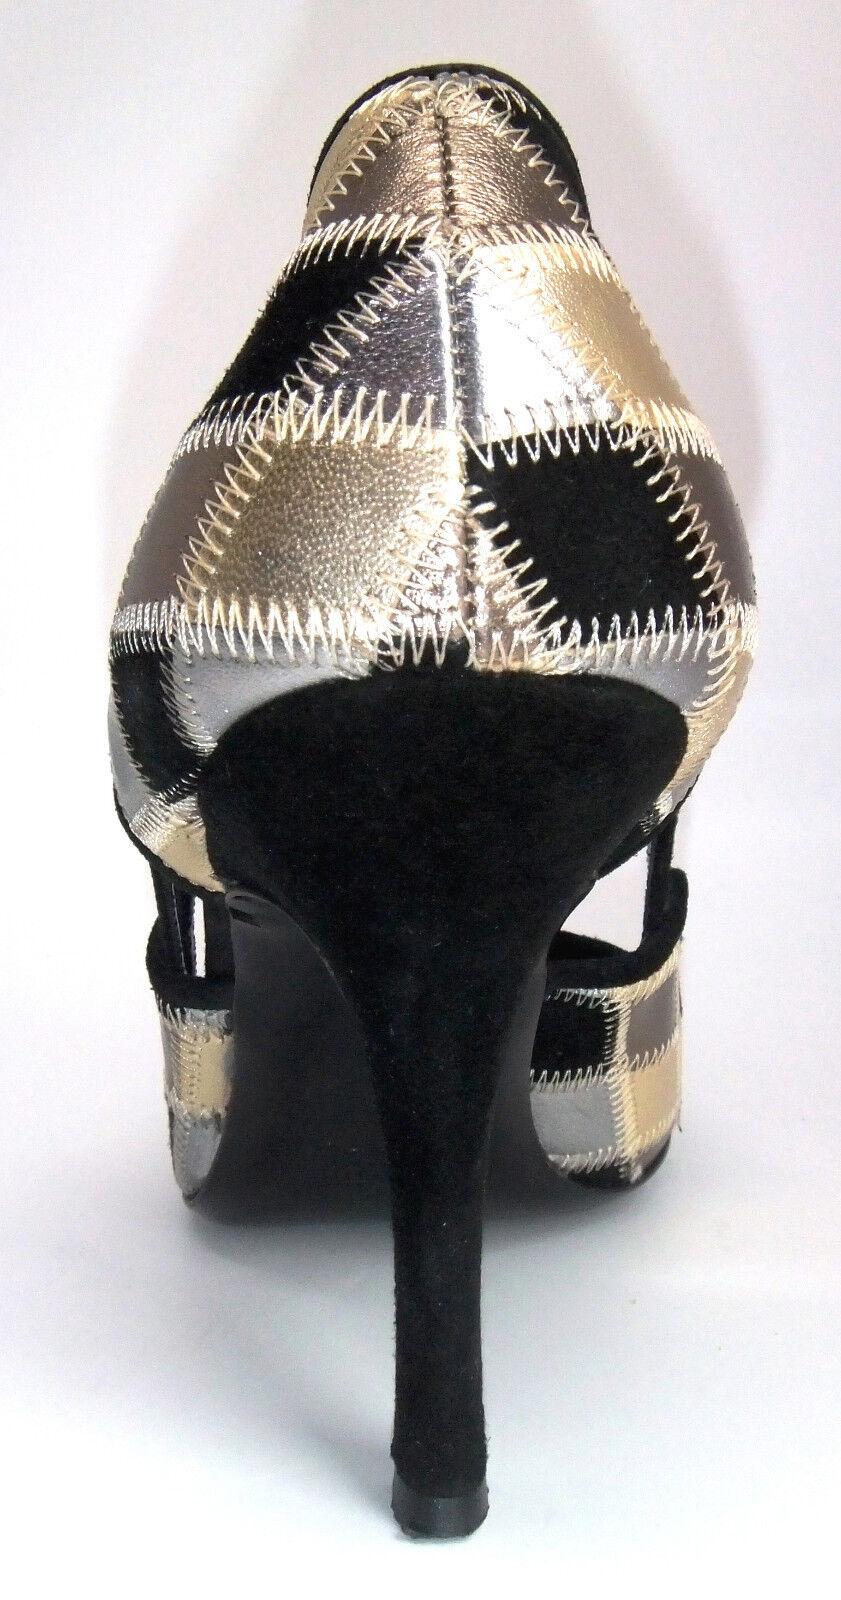 VALENTINO GARAVANI METALLIC METALLIC METALLIC gold Silver Bronze LEATHER & BLACK SUEDE SHOES, 38 8 37a856